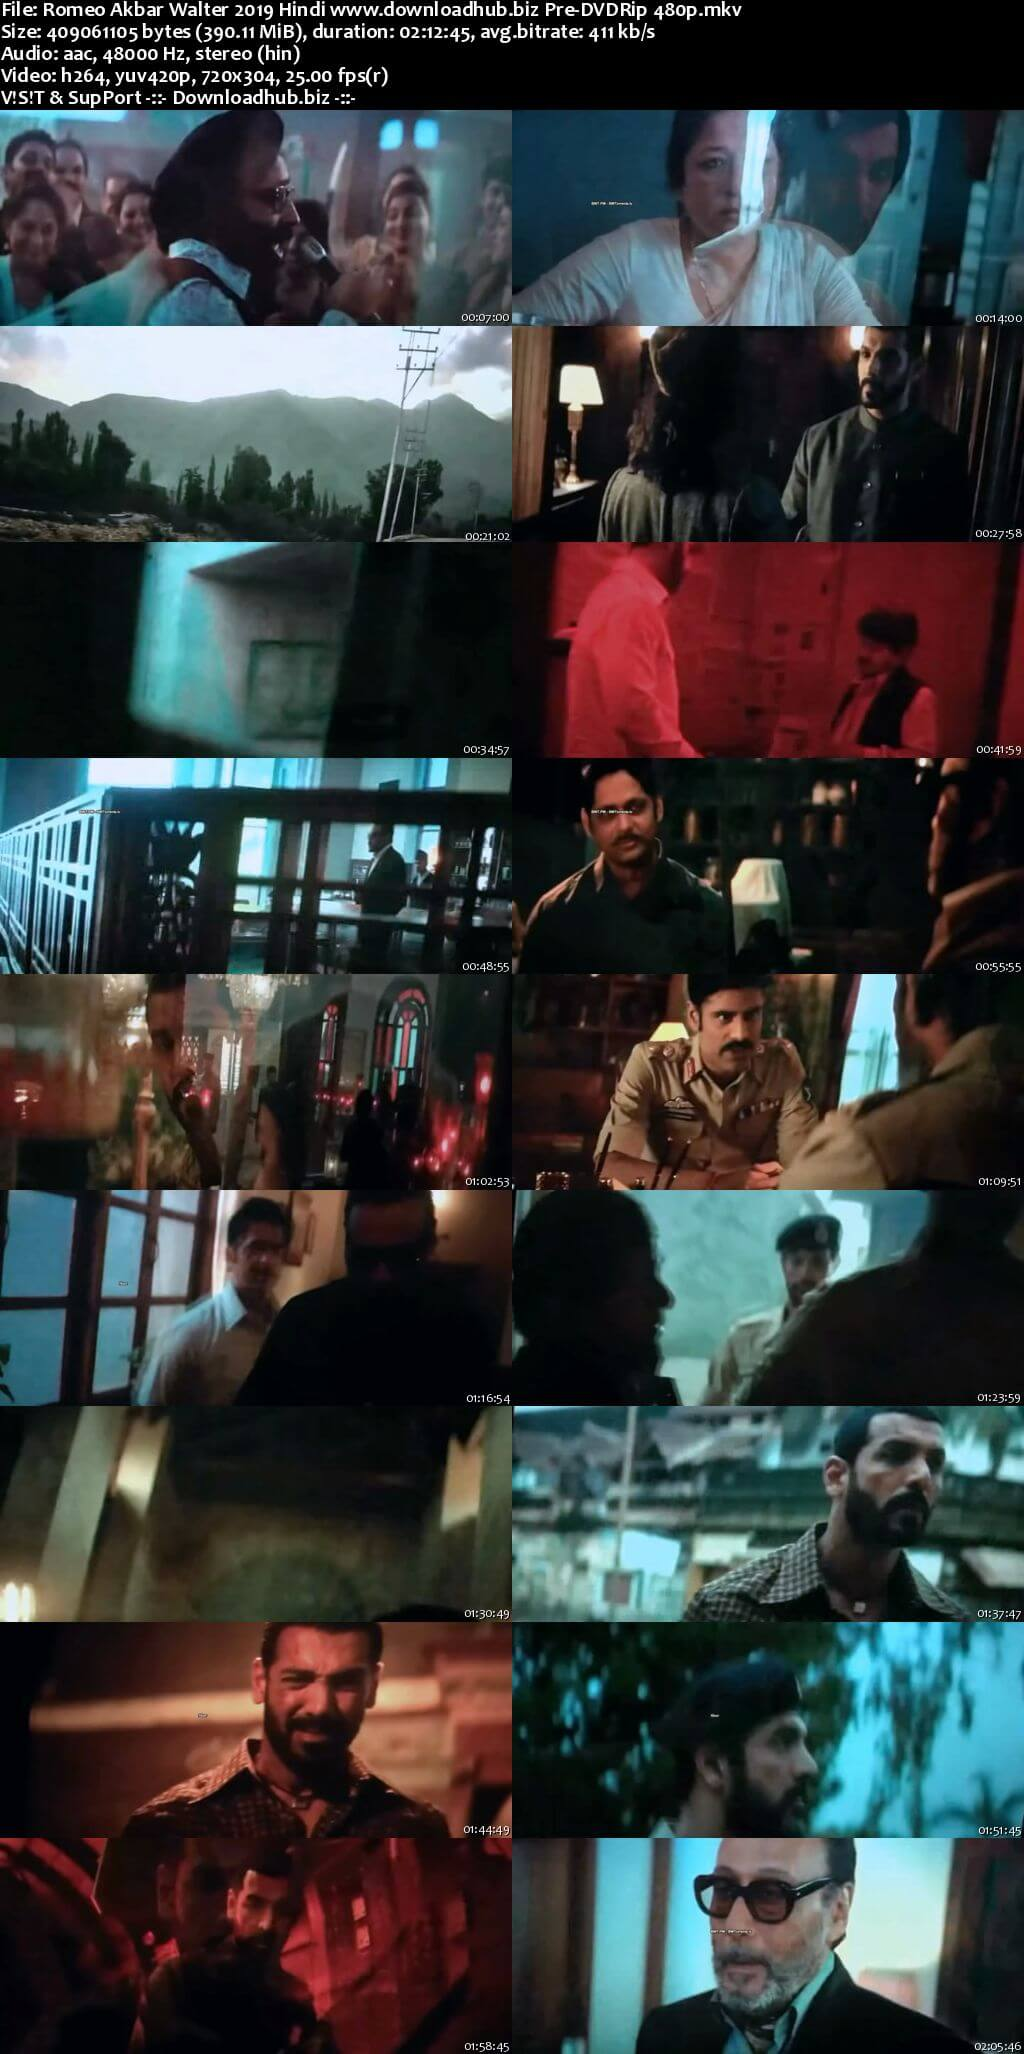 Romeo Akbar Walter 2019 Hindi 350MB Pre-DVDRip 480p